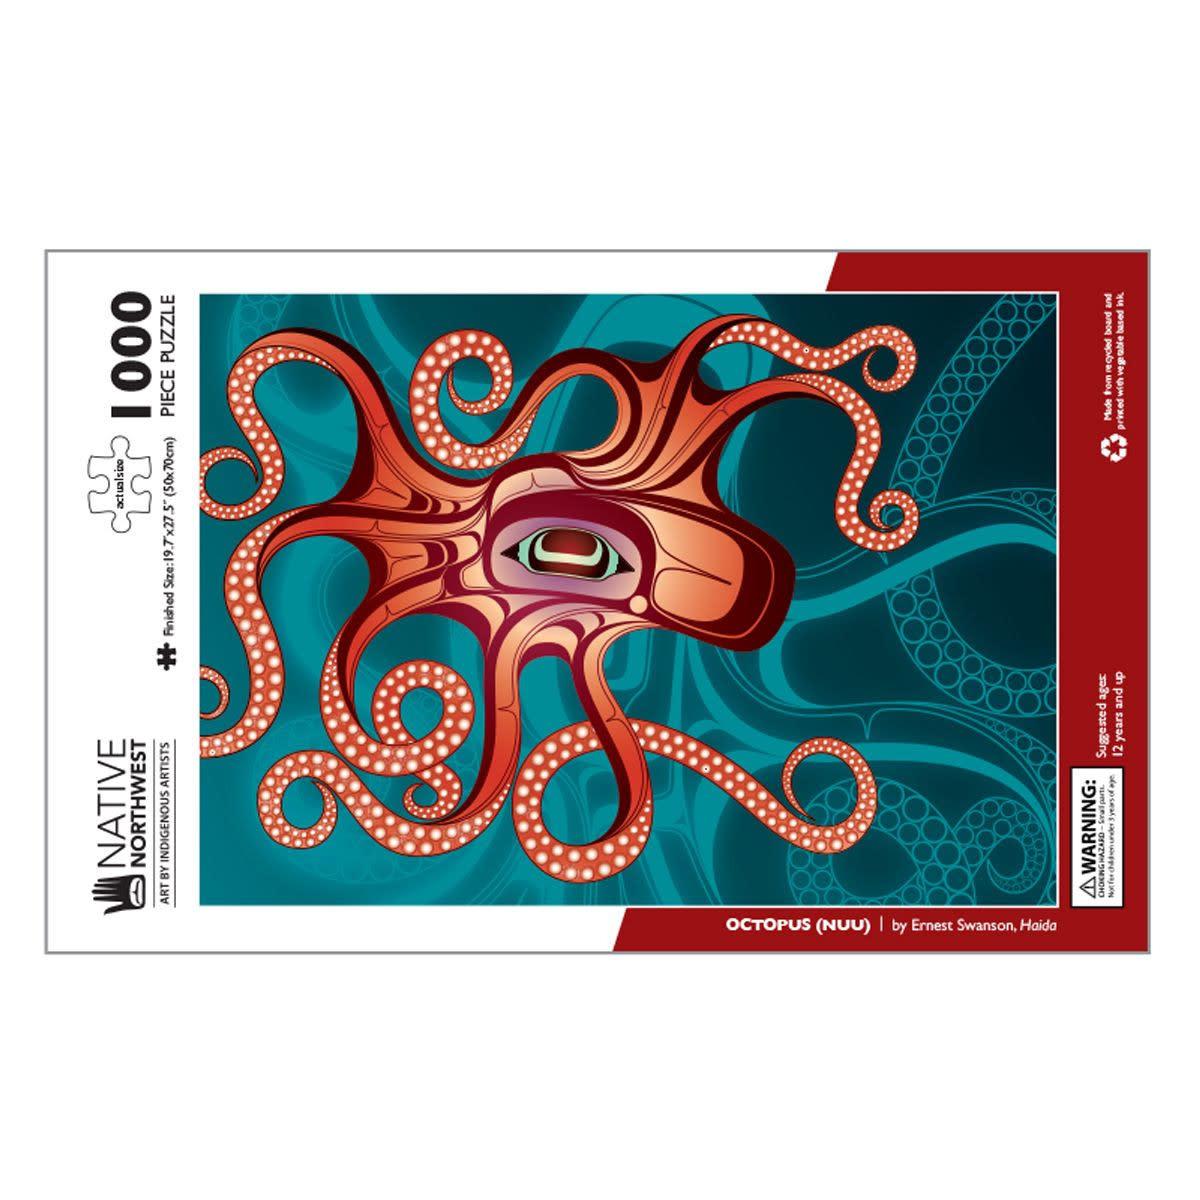 1000 pcs Puzzle- Octopus (Nuu) by Earnest Swanson-2